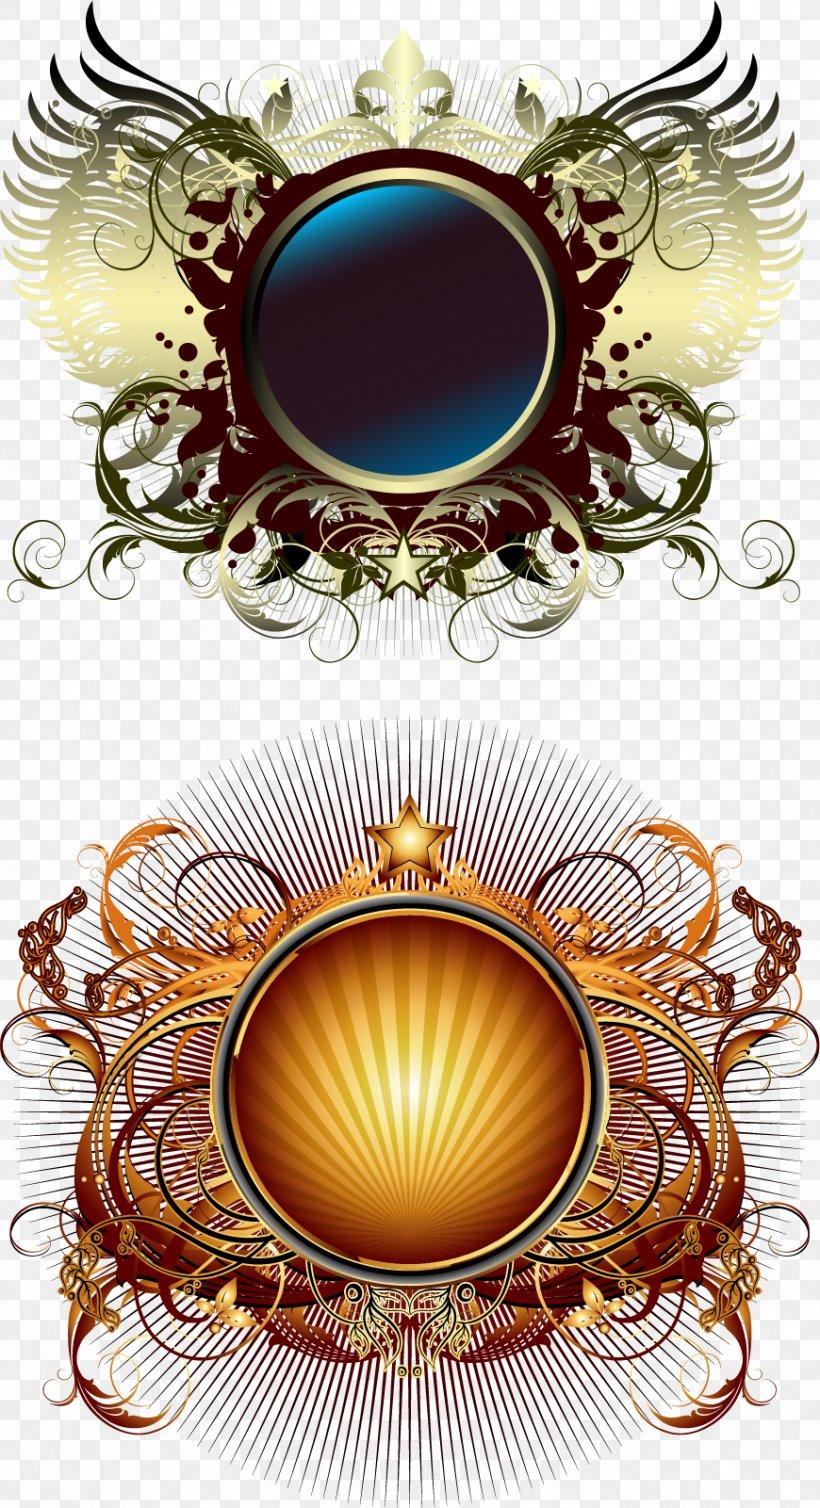 Shield Heraldry Escutcheon, PNG, 870x1601px, Shield, Art, Escutcheon, Heraldry, Illustration Download Free